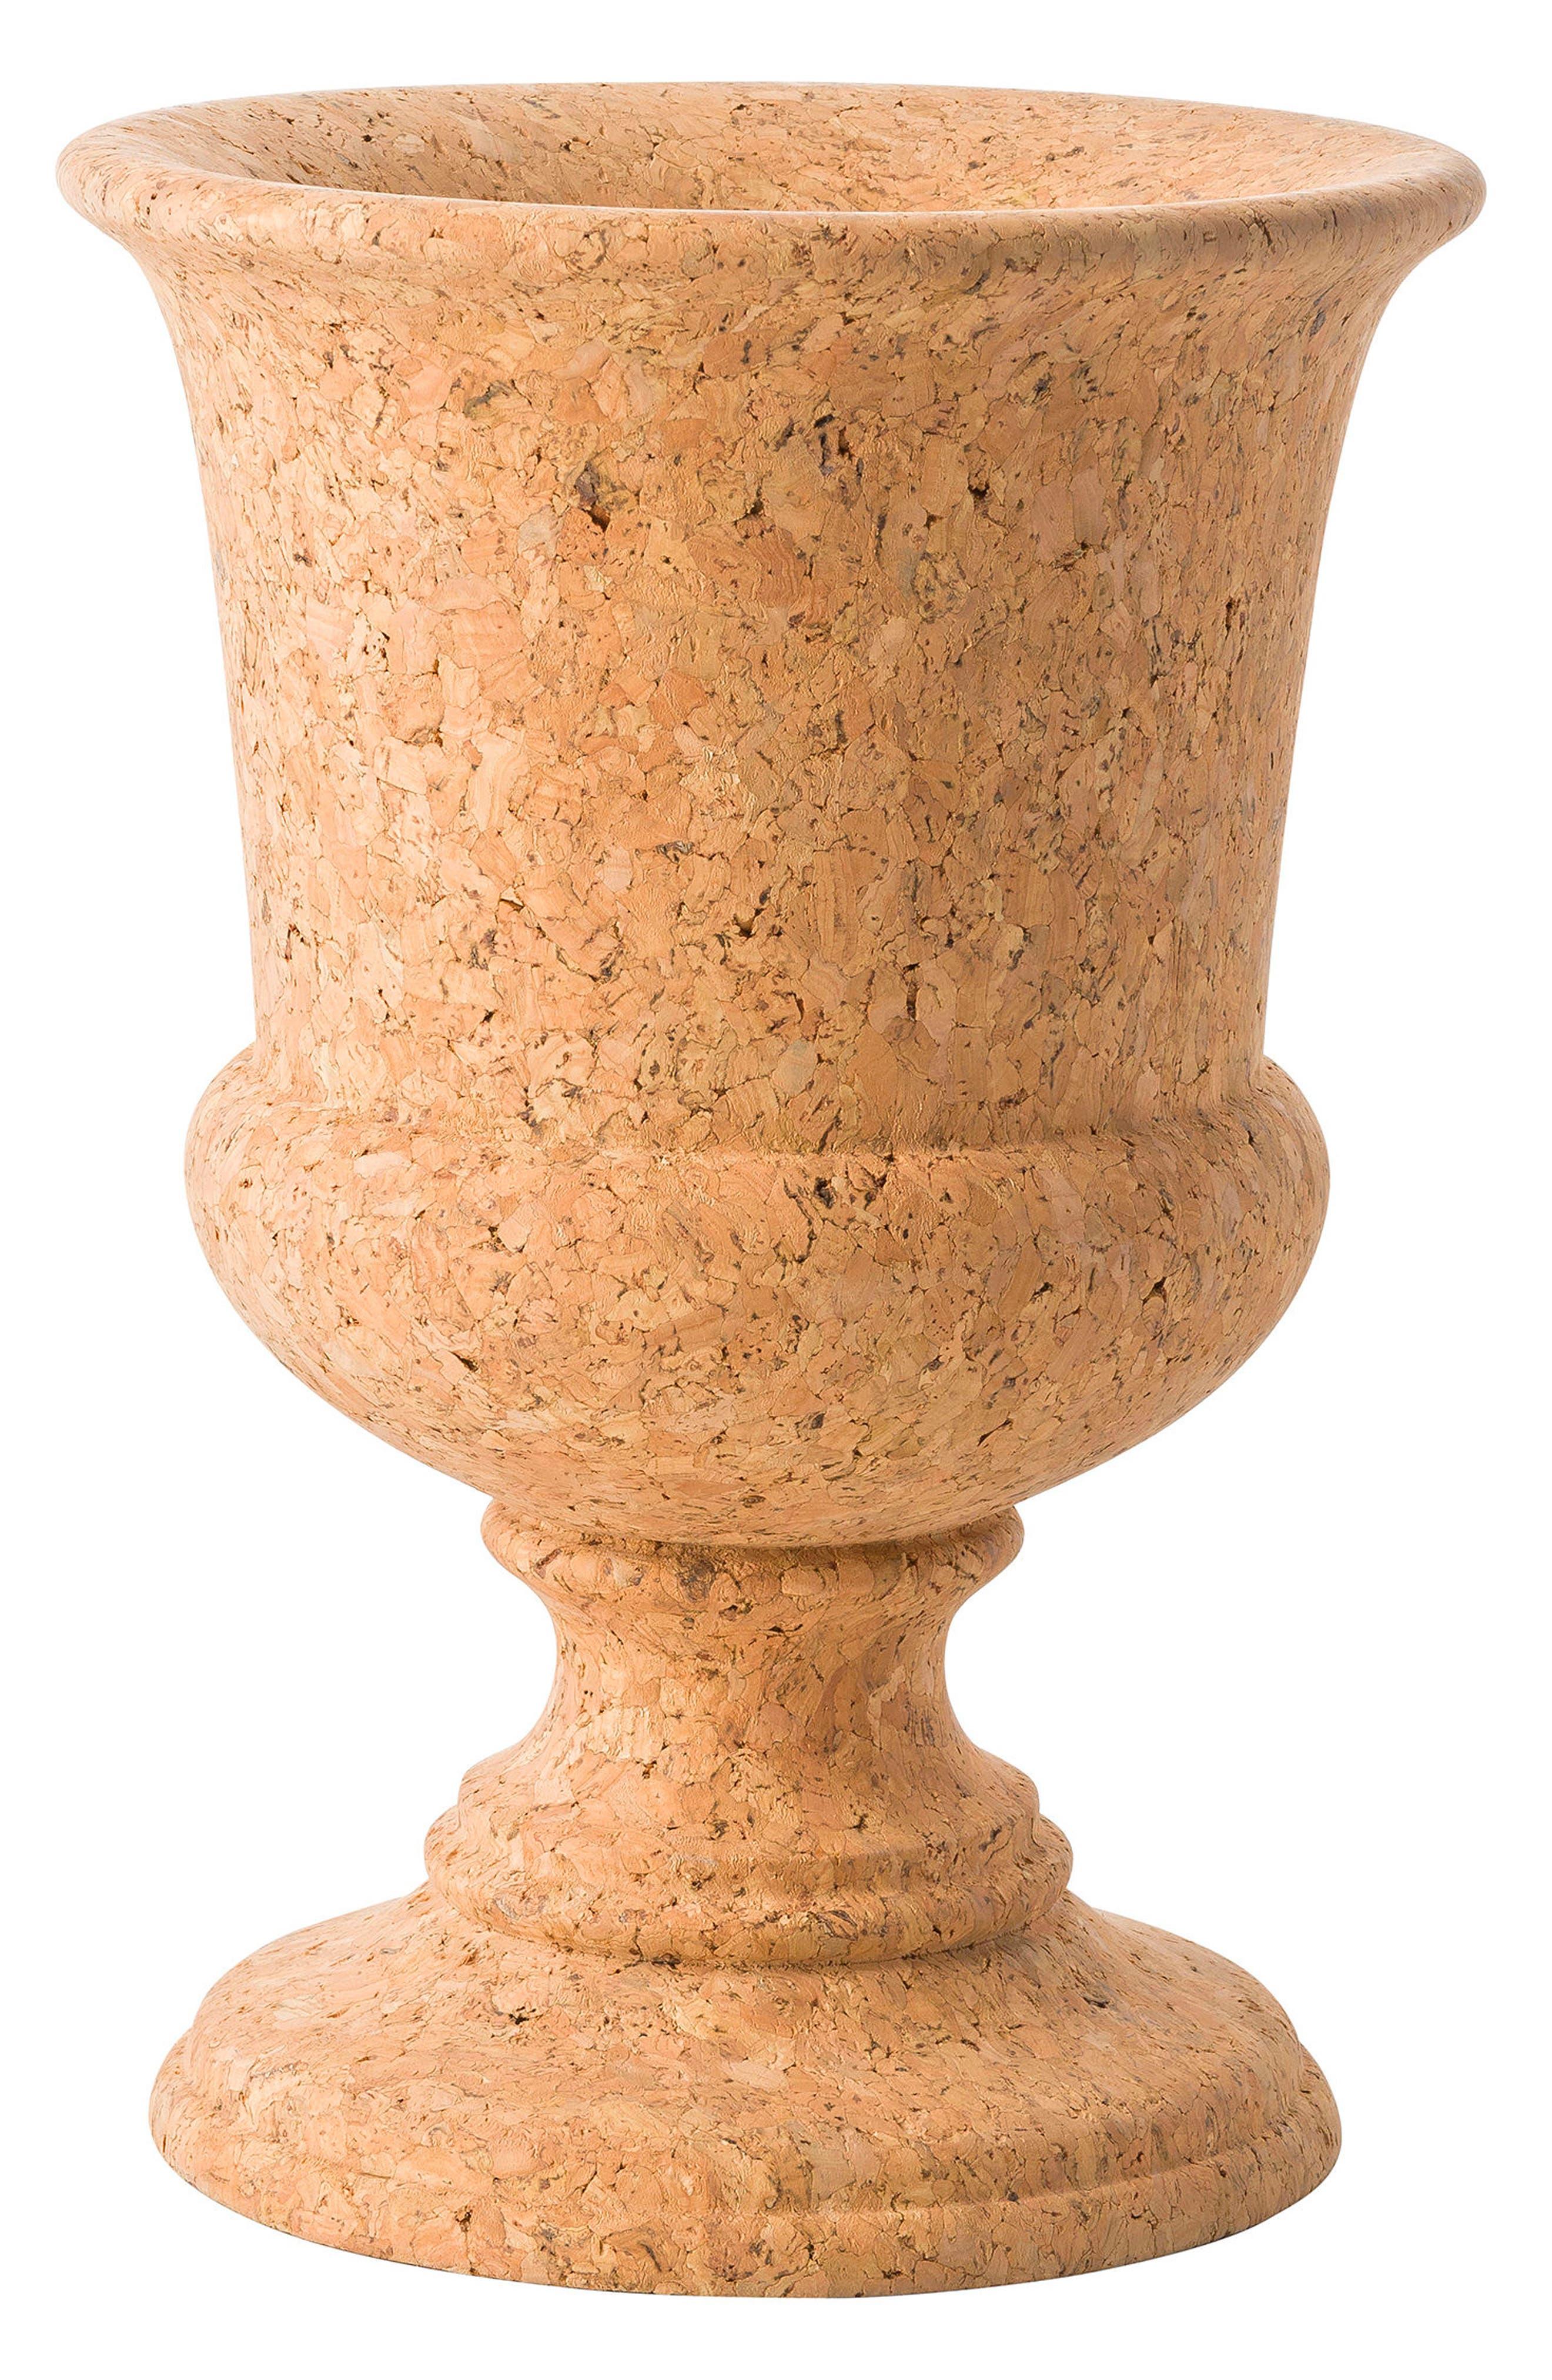 Alternate Image 1 Selected - Juliska Quinta Natural Cork Urn